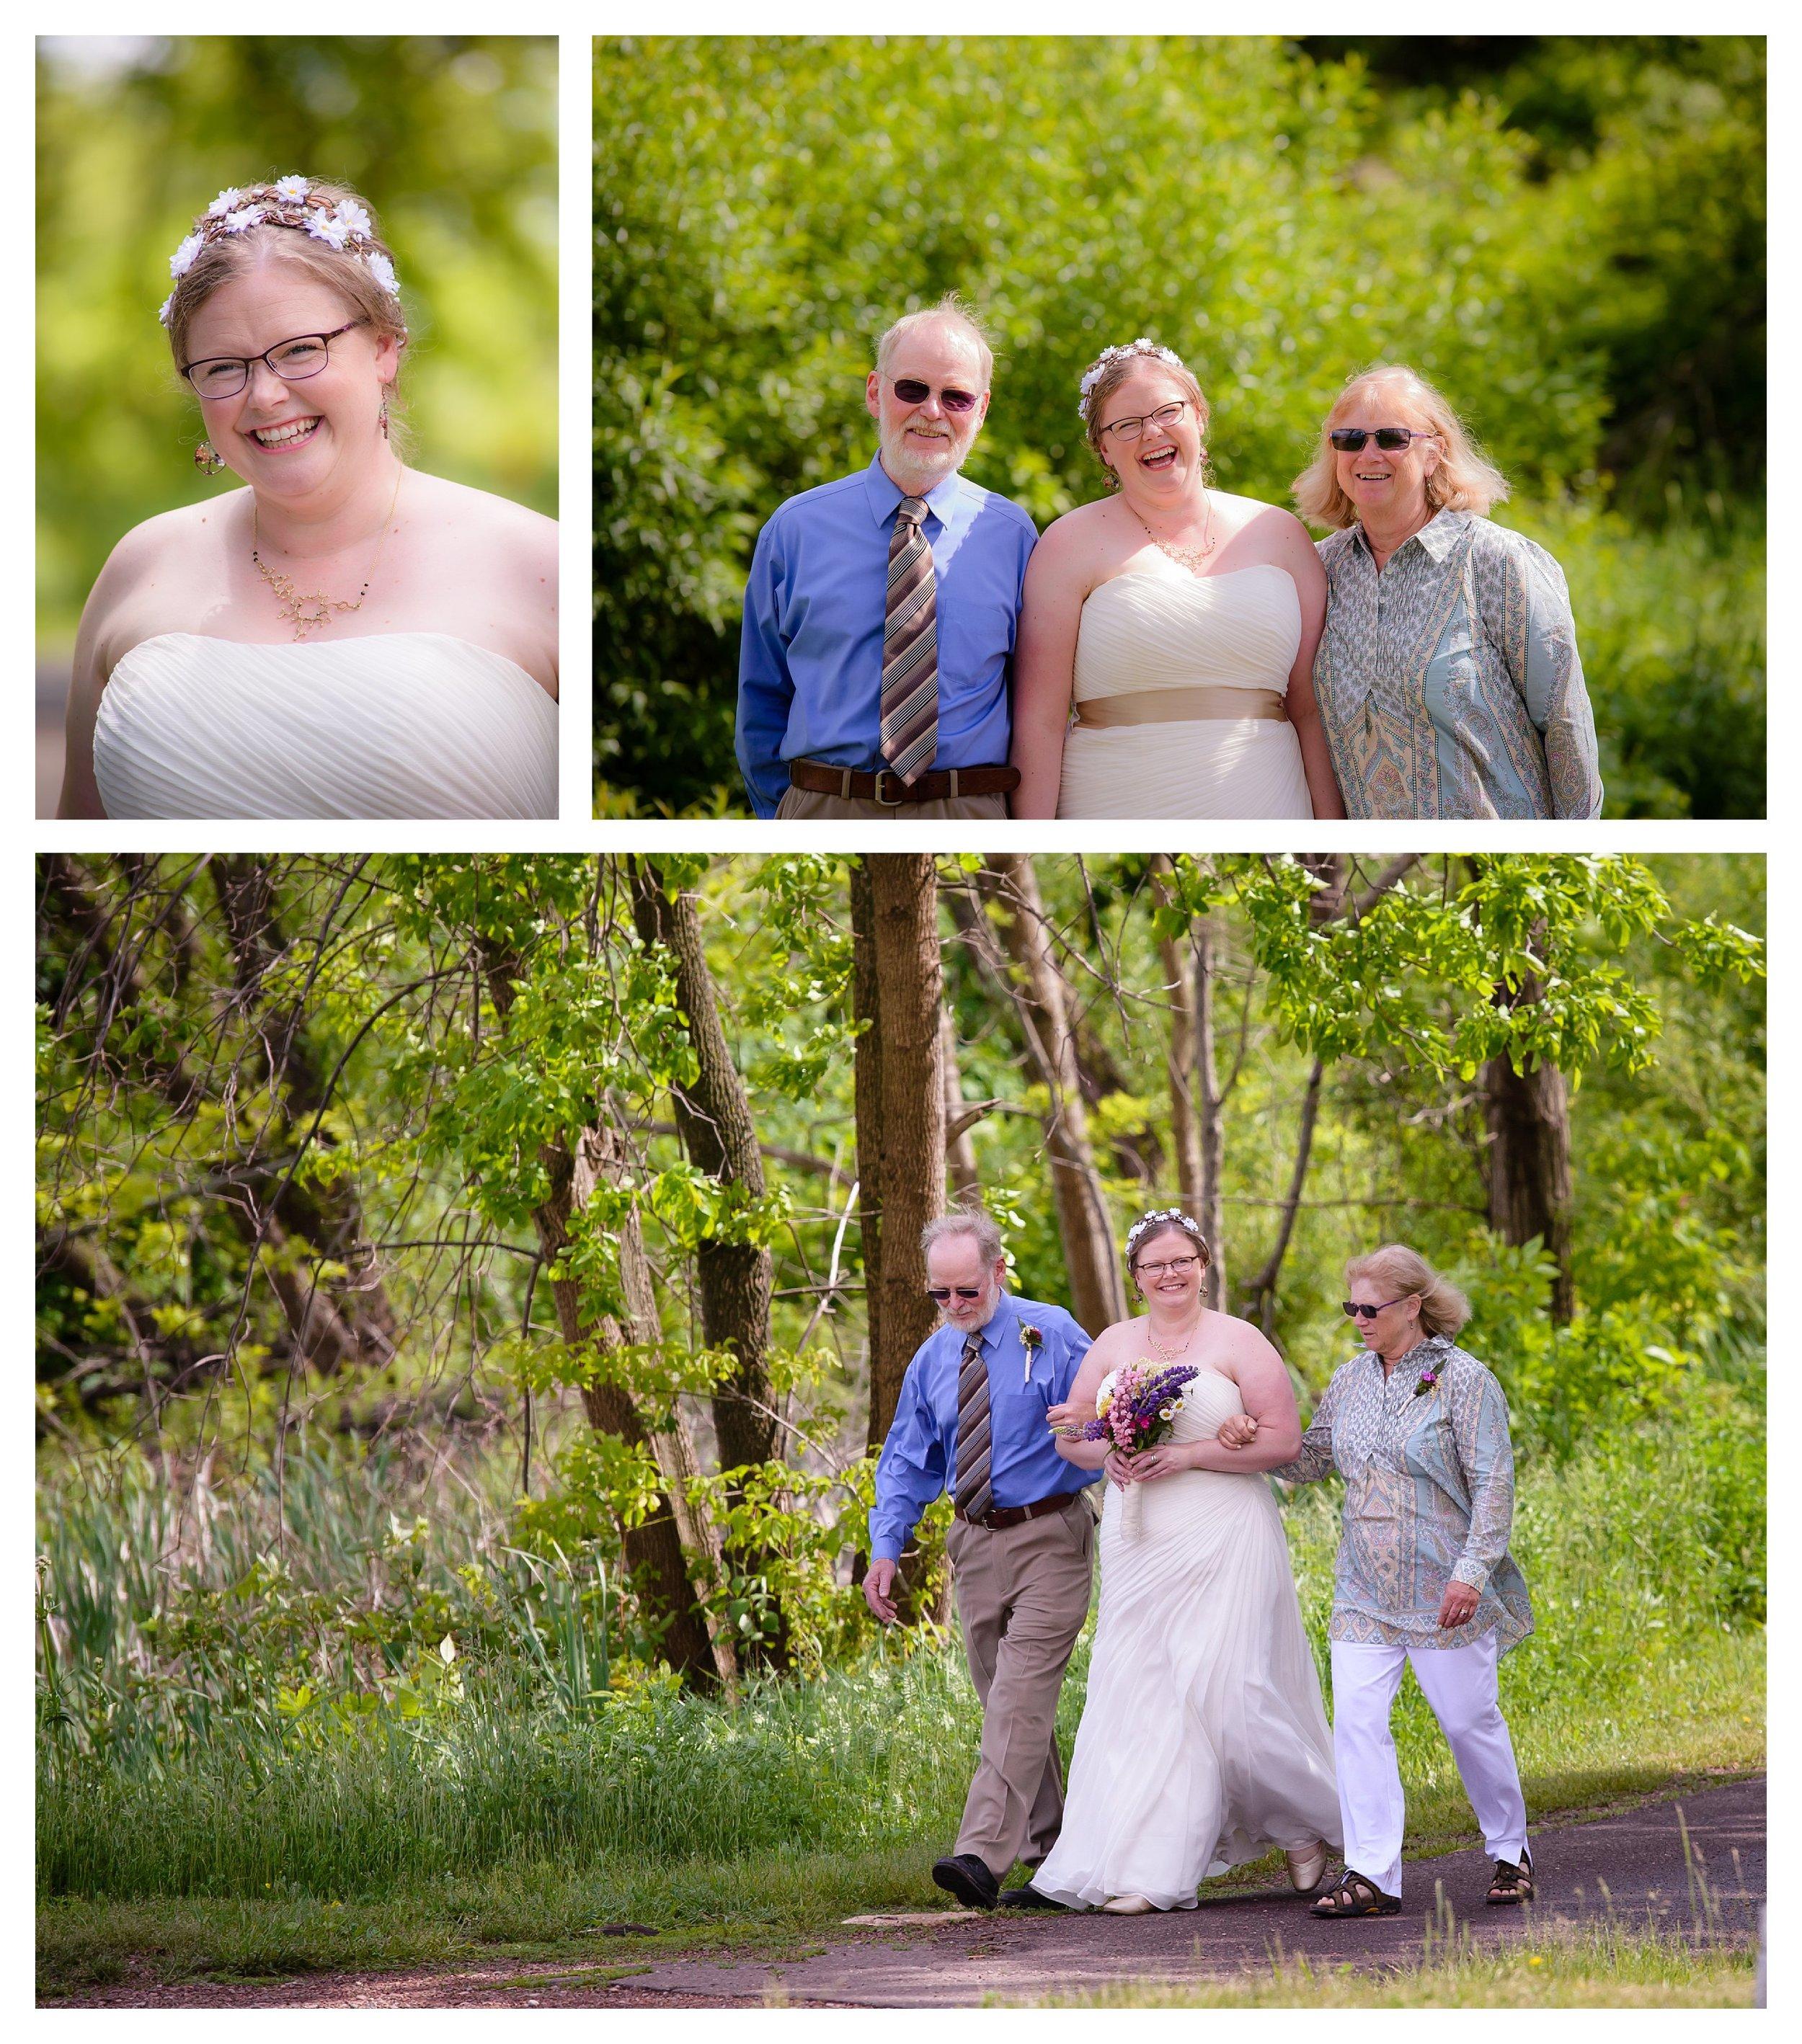 ashland oredock northwoods wisconsin wedding ps 139 photography_0281.jpg